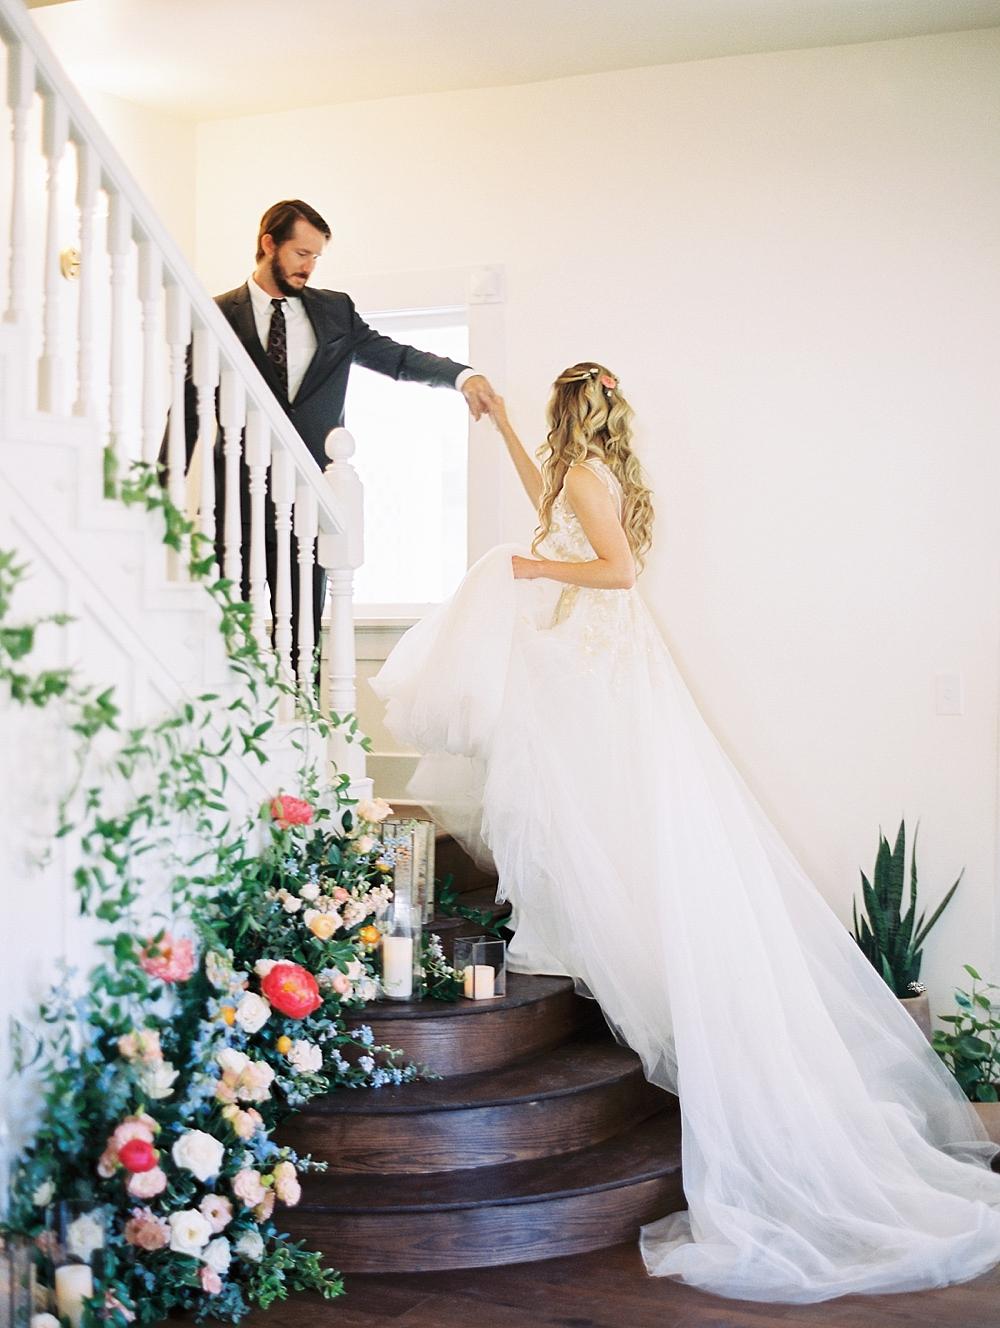 Kristin-La-Voie-Photography-Austin-Wedding-Photographer-the-grand-lady-143